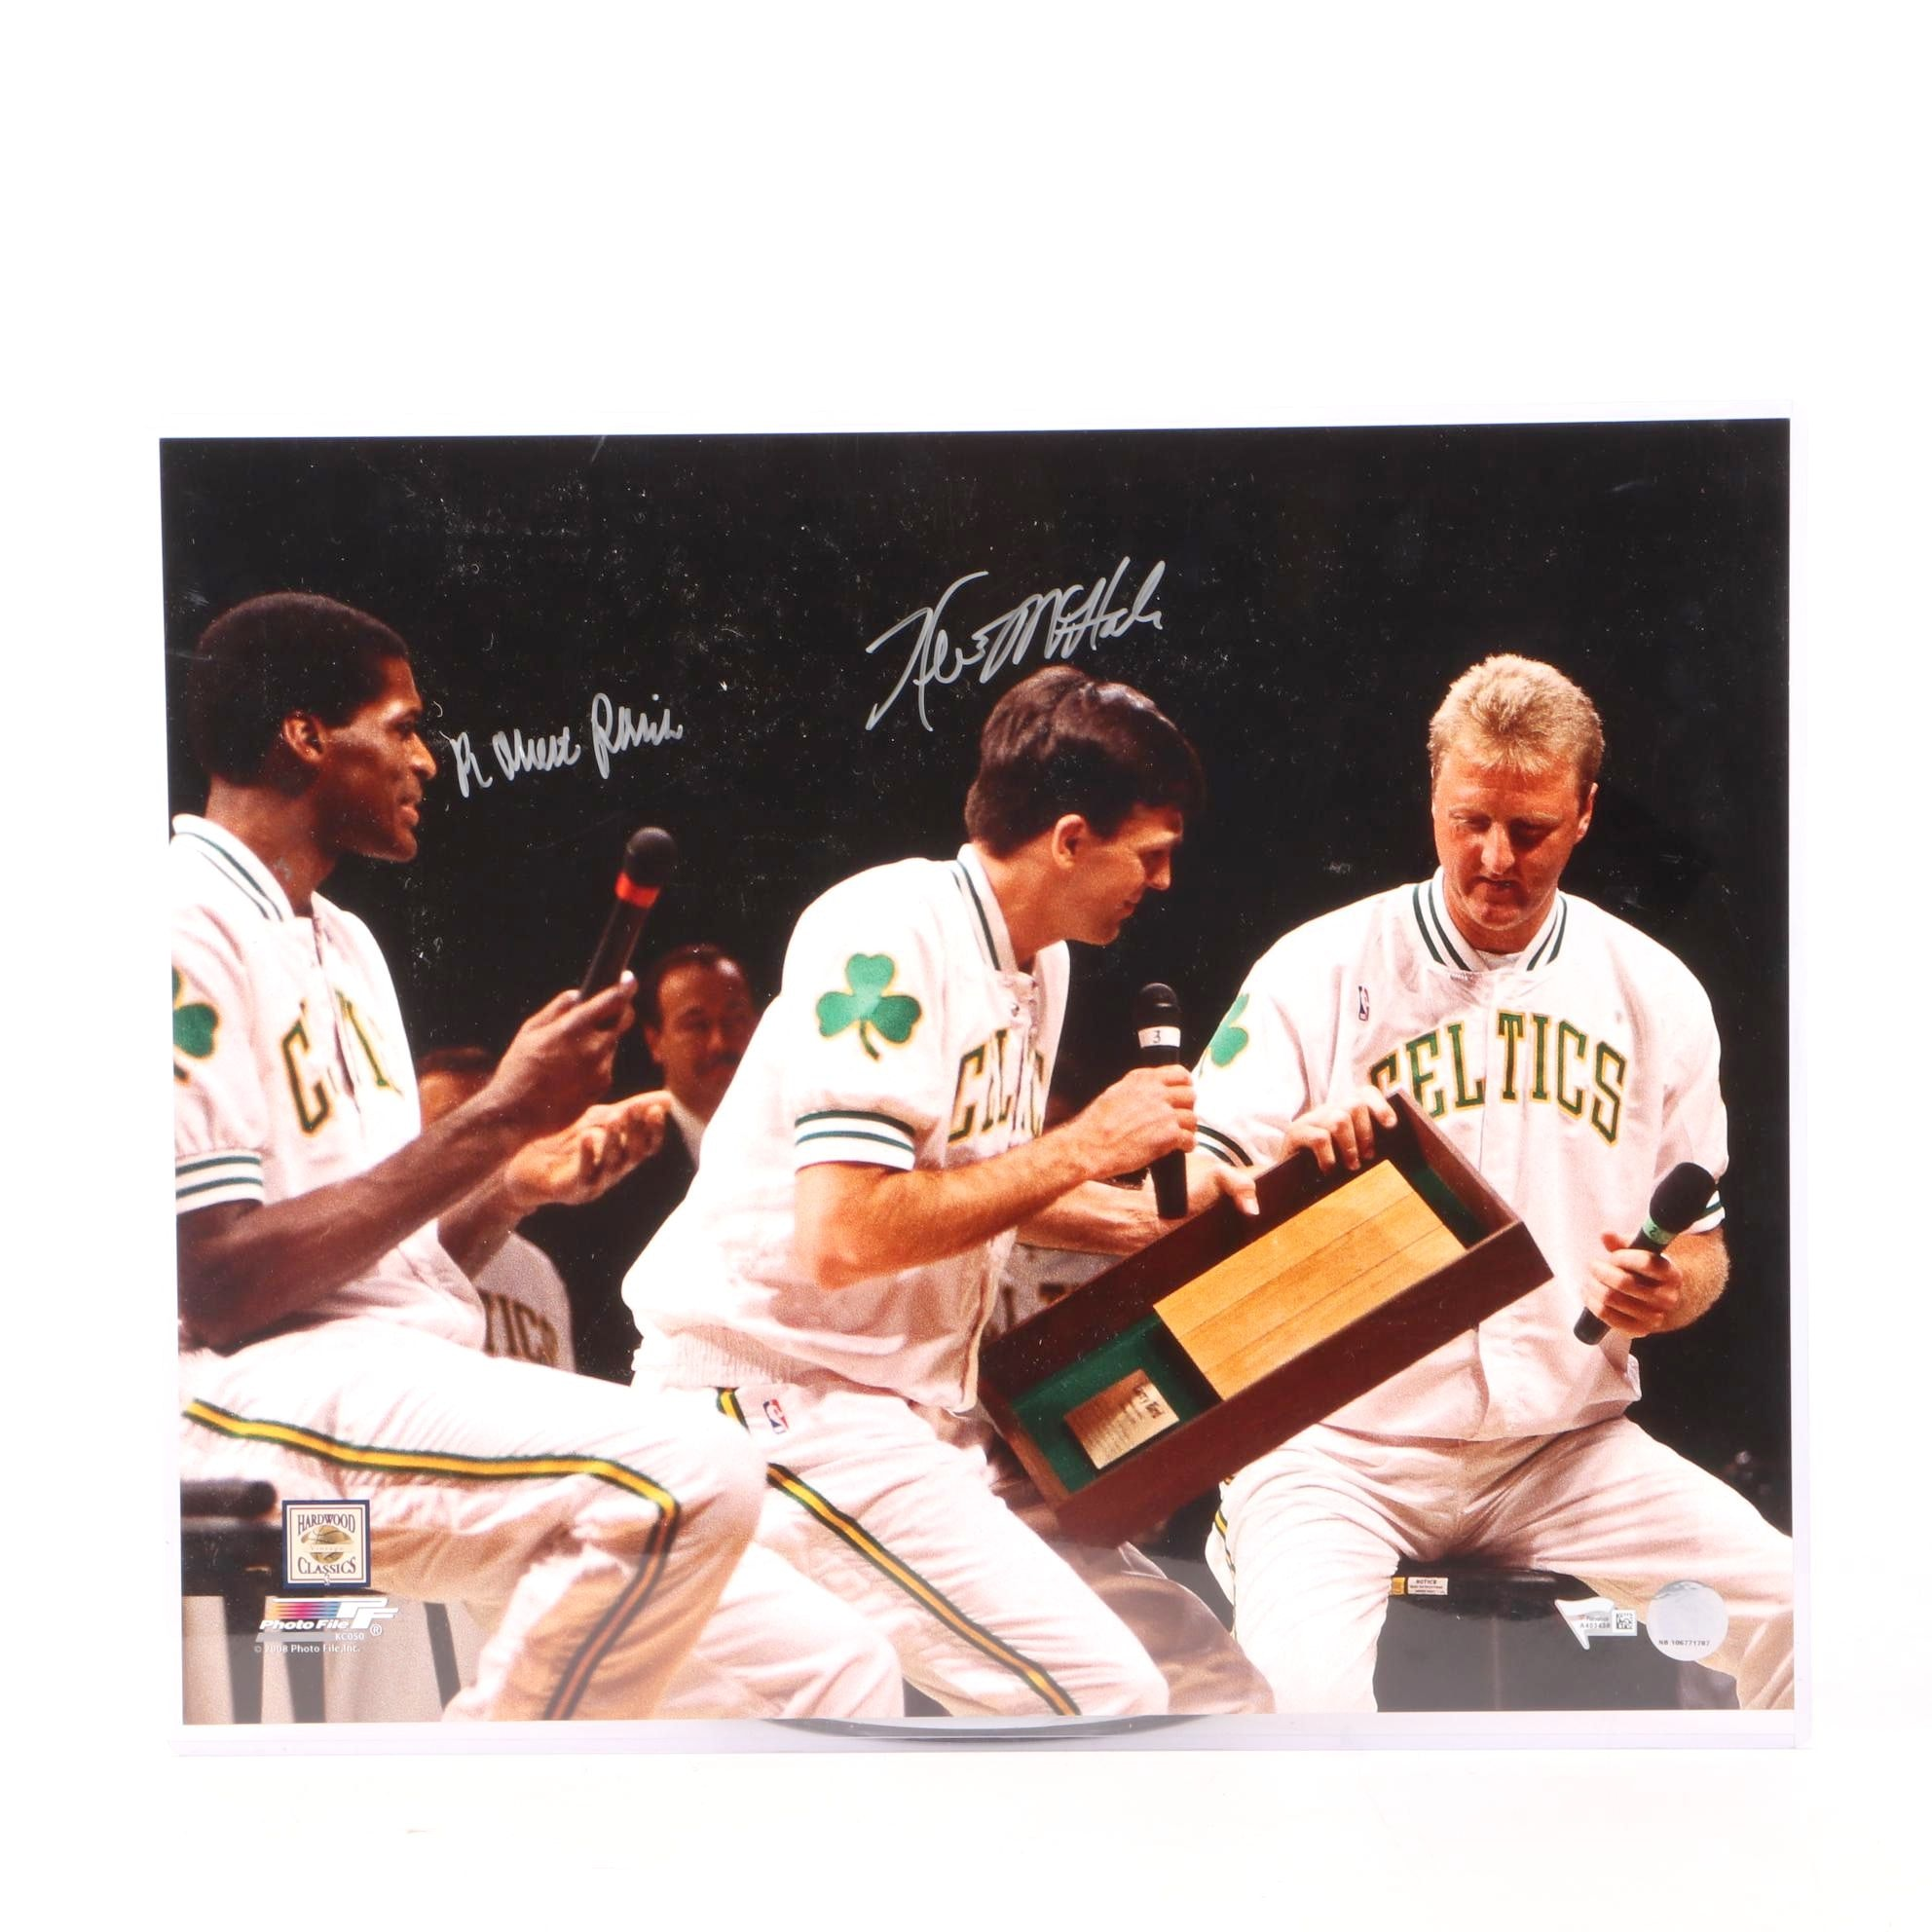 Kevin McHale and Robert Parrish Signed Boston Celtics Basketball Photo Print COA